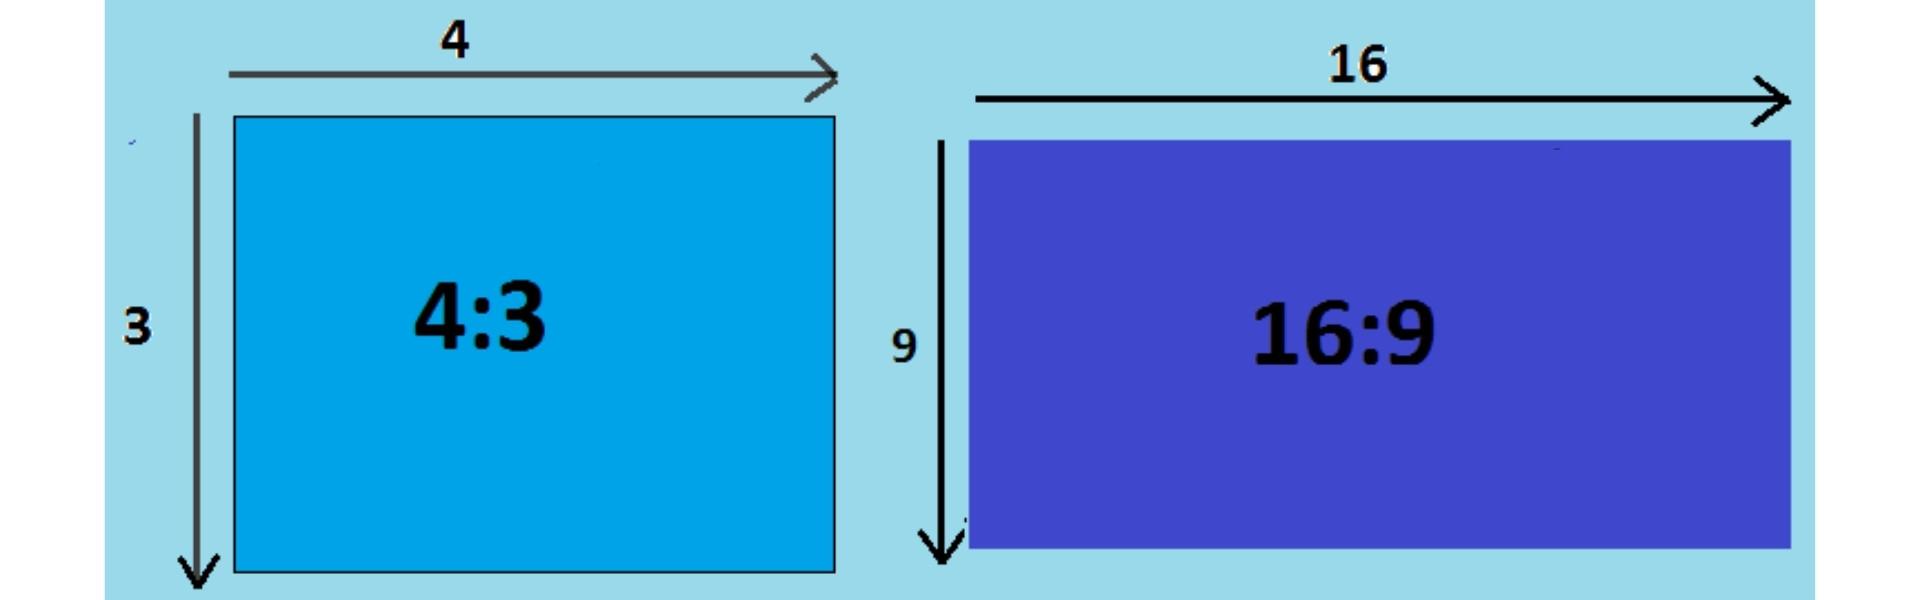 Aspect ratios of various sizes: 4: 3, 16: 9.